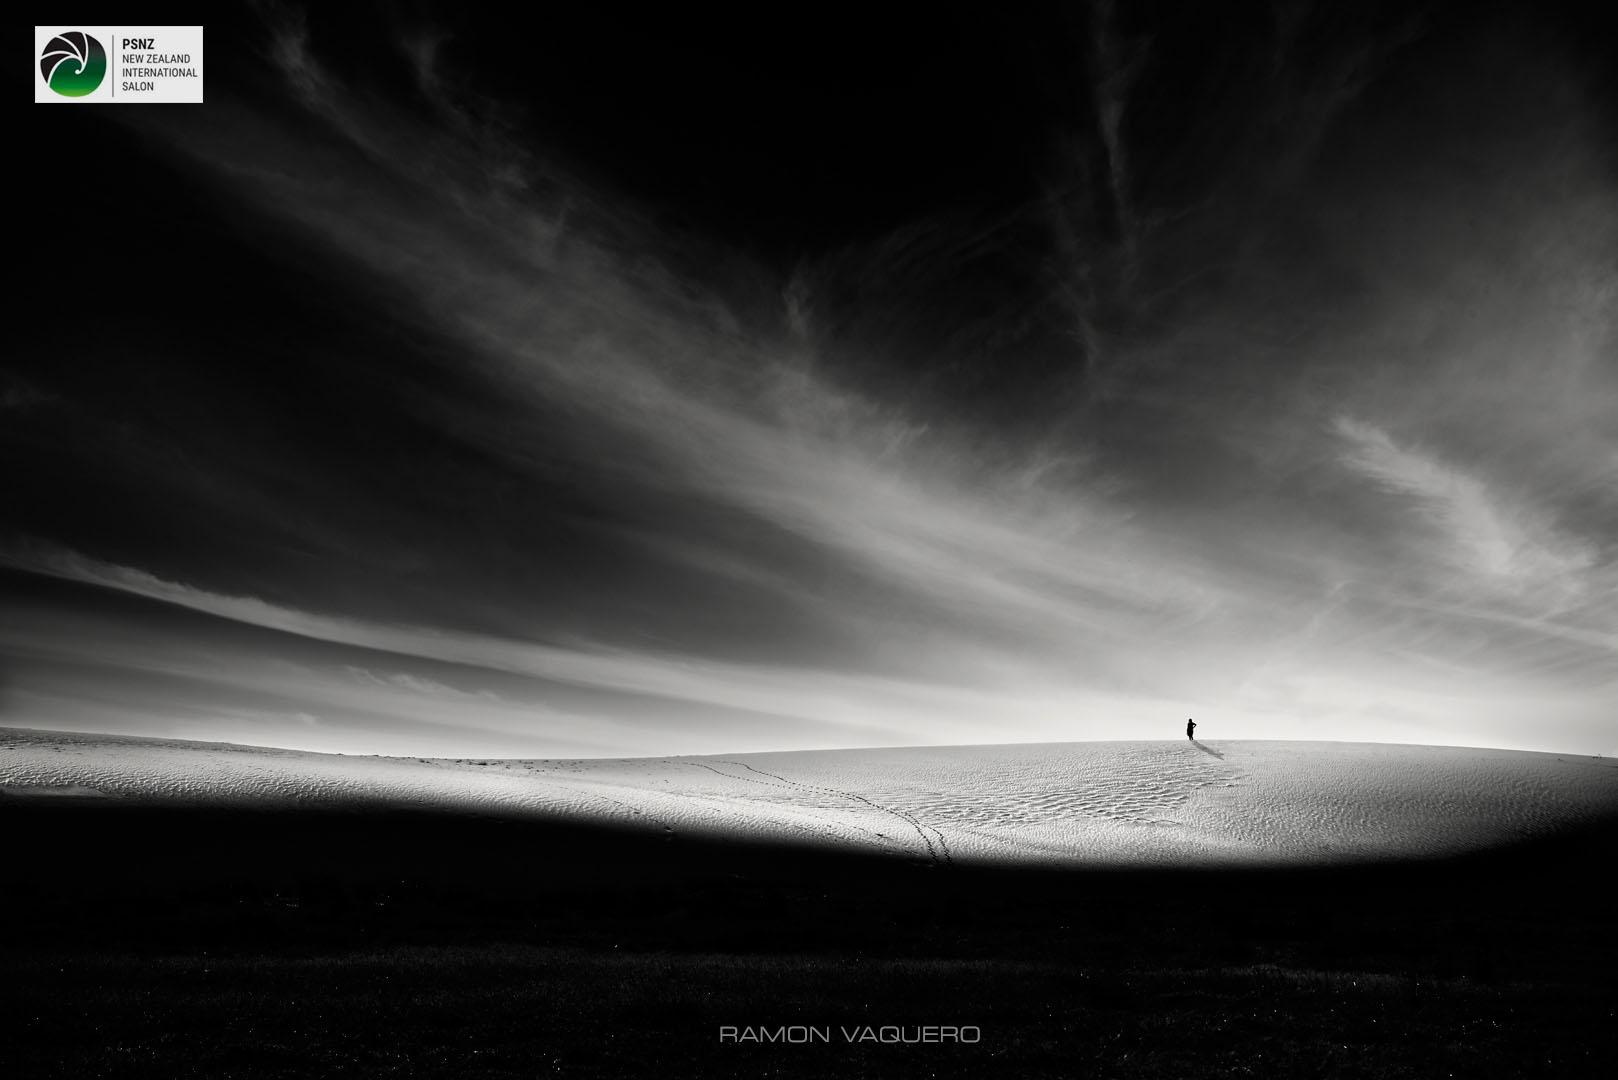 ramonvaquero_new-zealand-international-salon_The-Dune